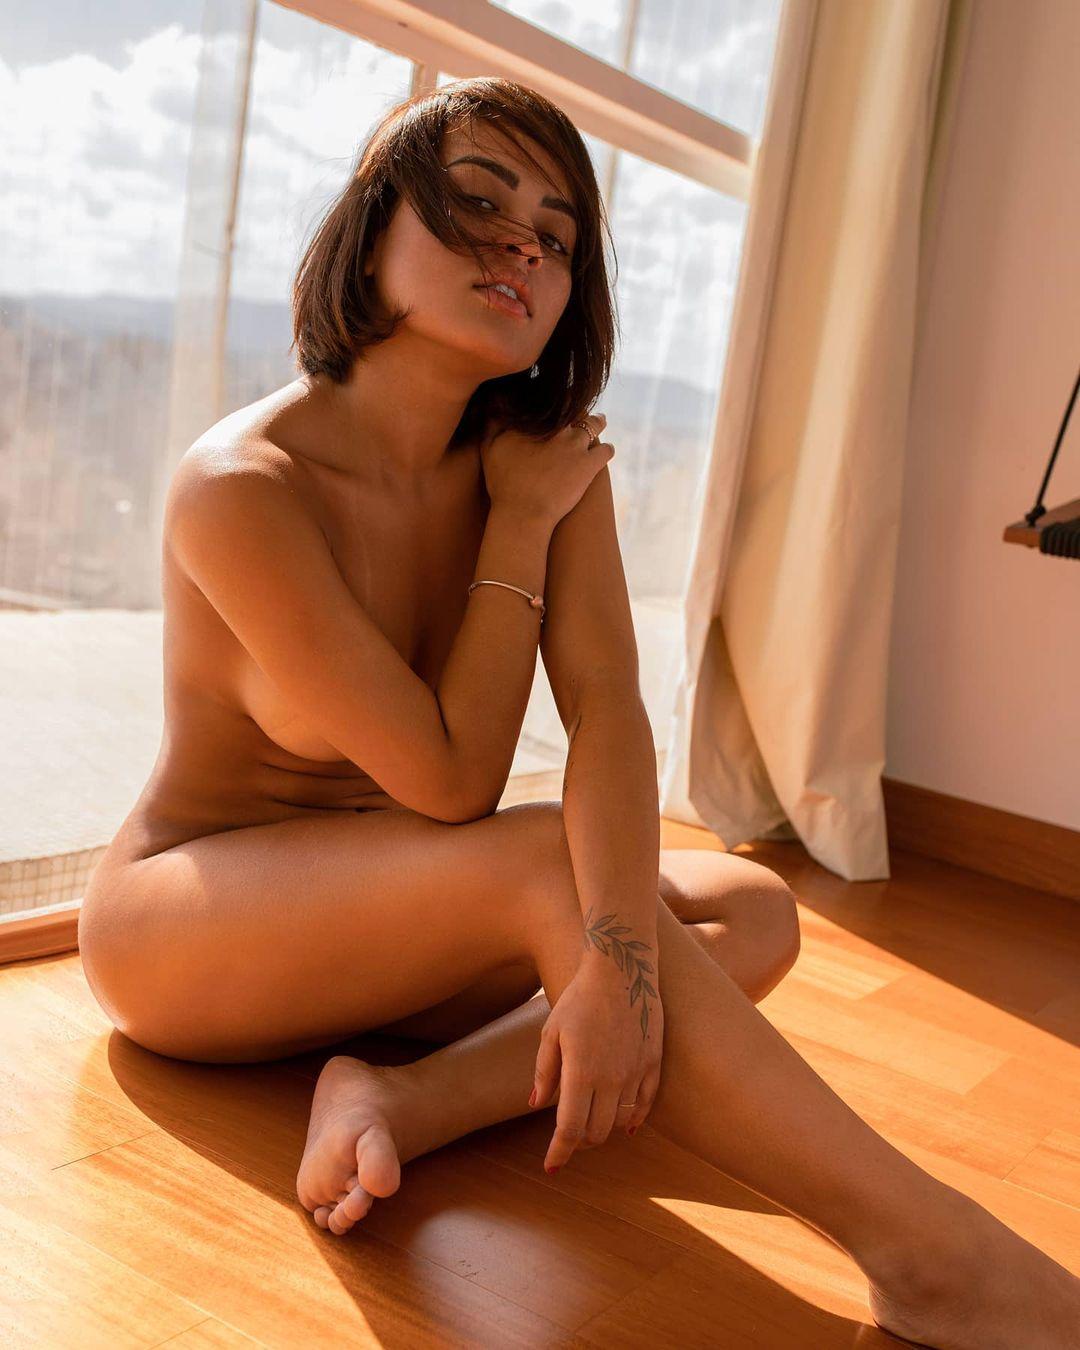 Чувственные снимки девушек от Джарбаса Прадо